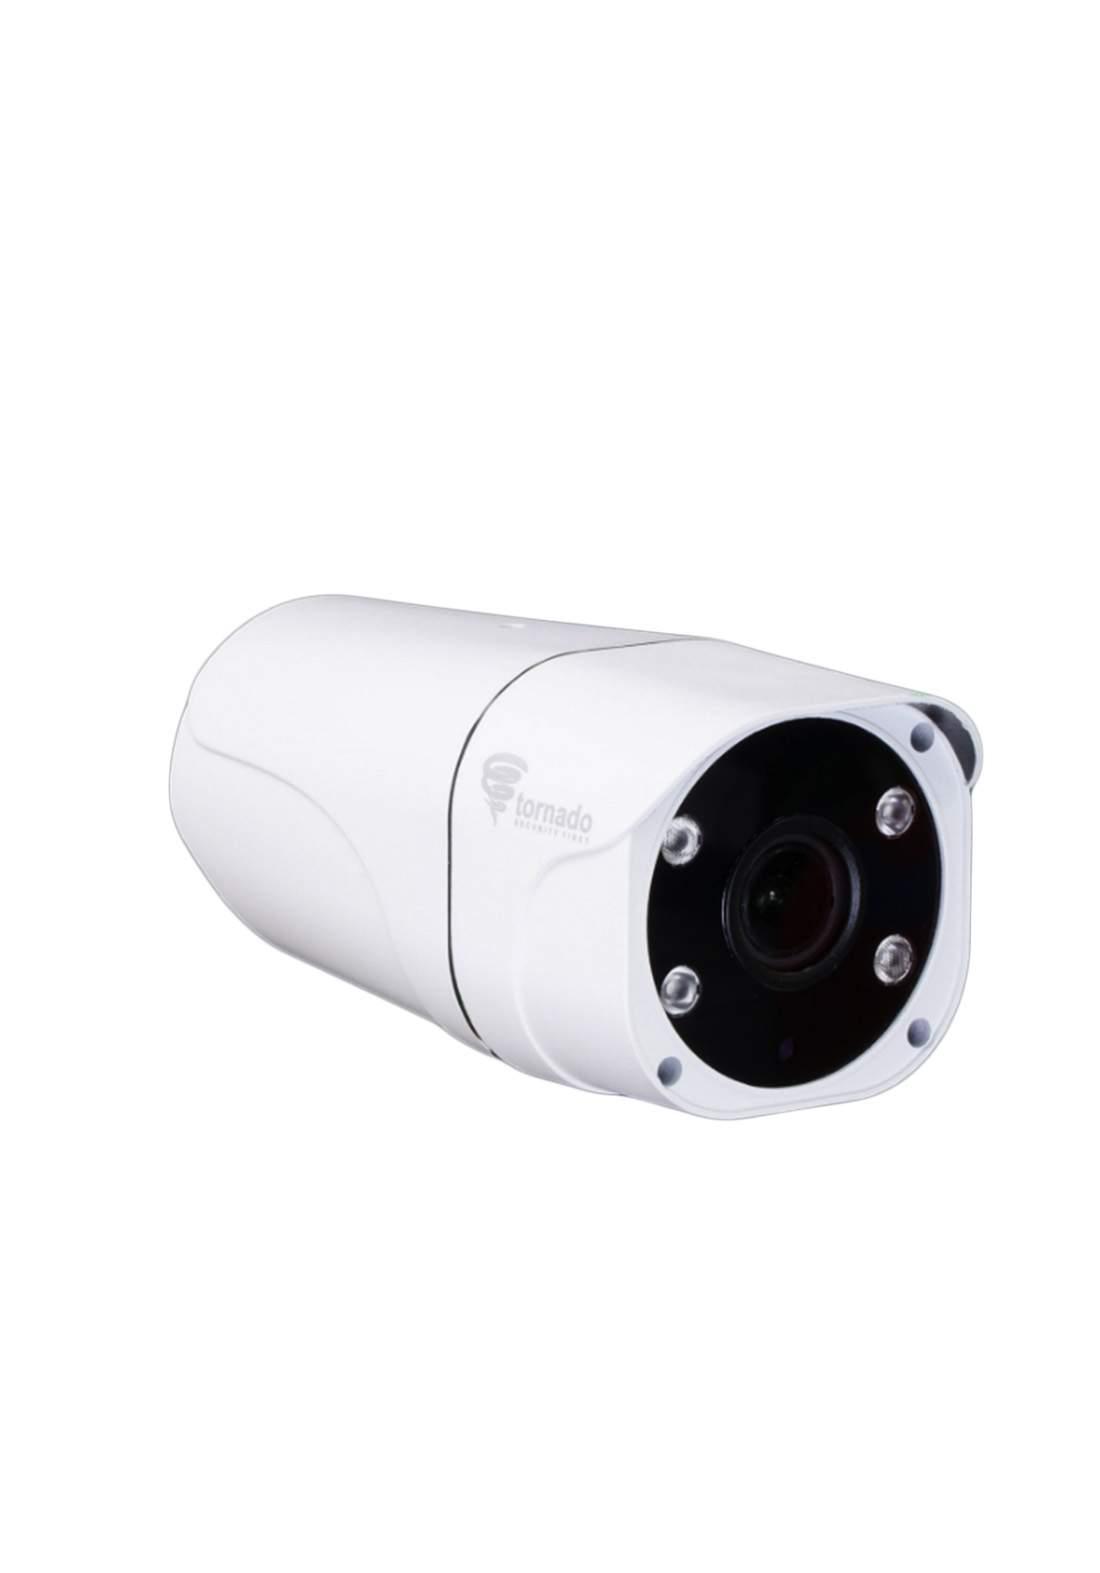 Tornado 7855 AHD 5mp Security Camera - White  كاميرا مراقبة